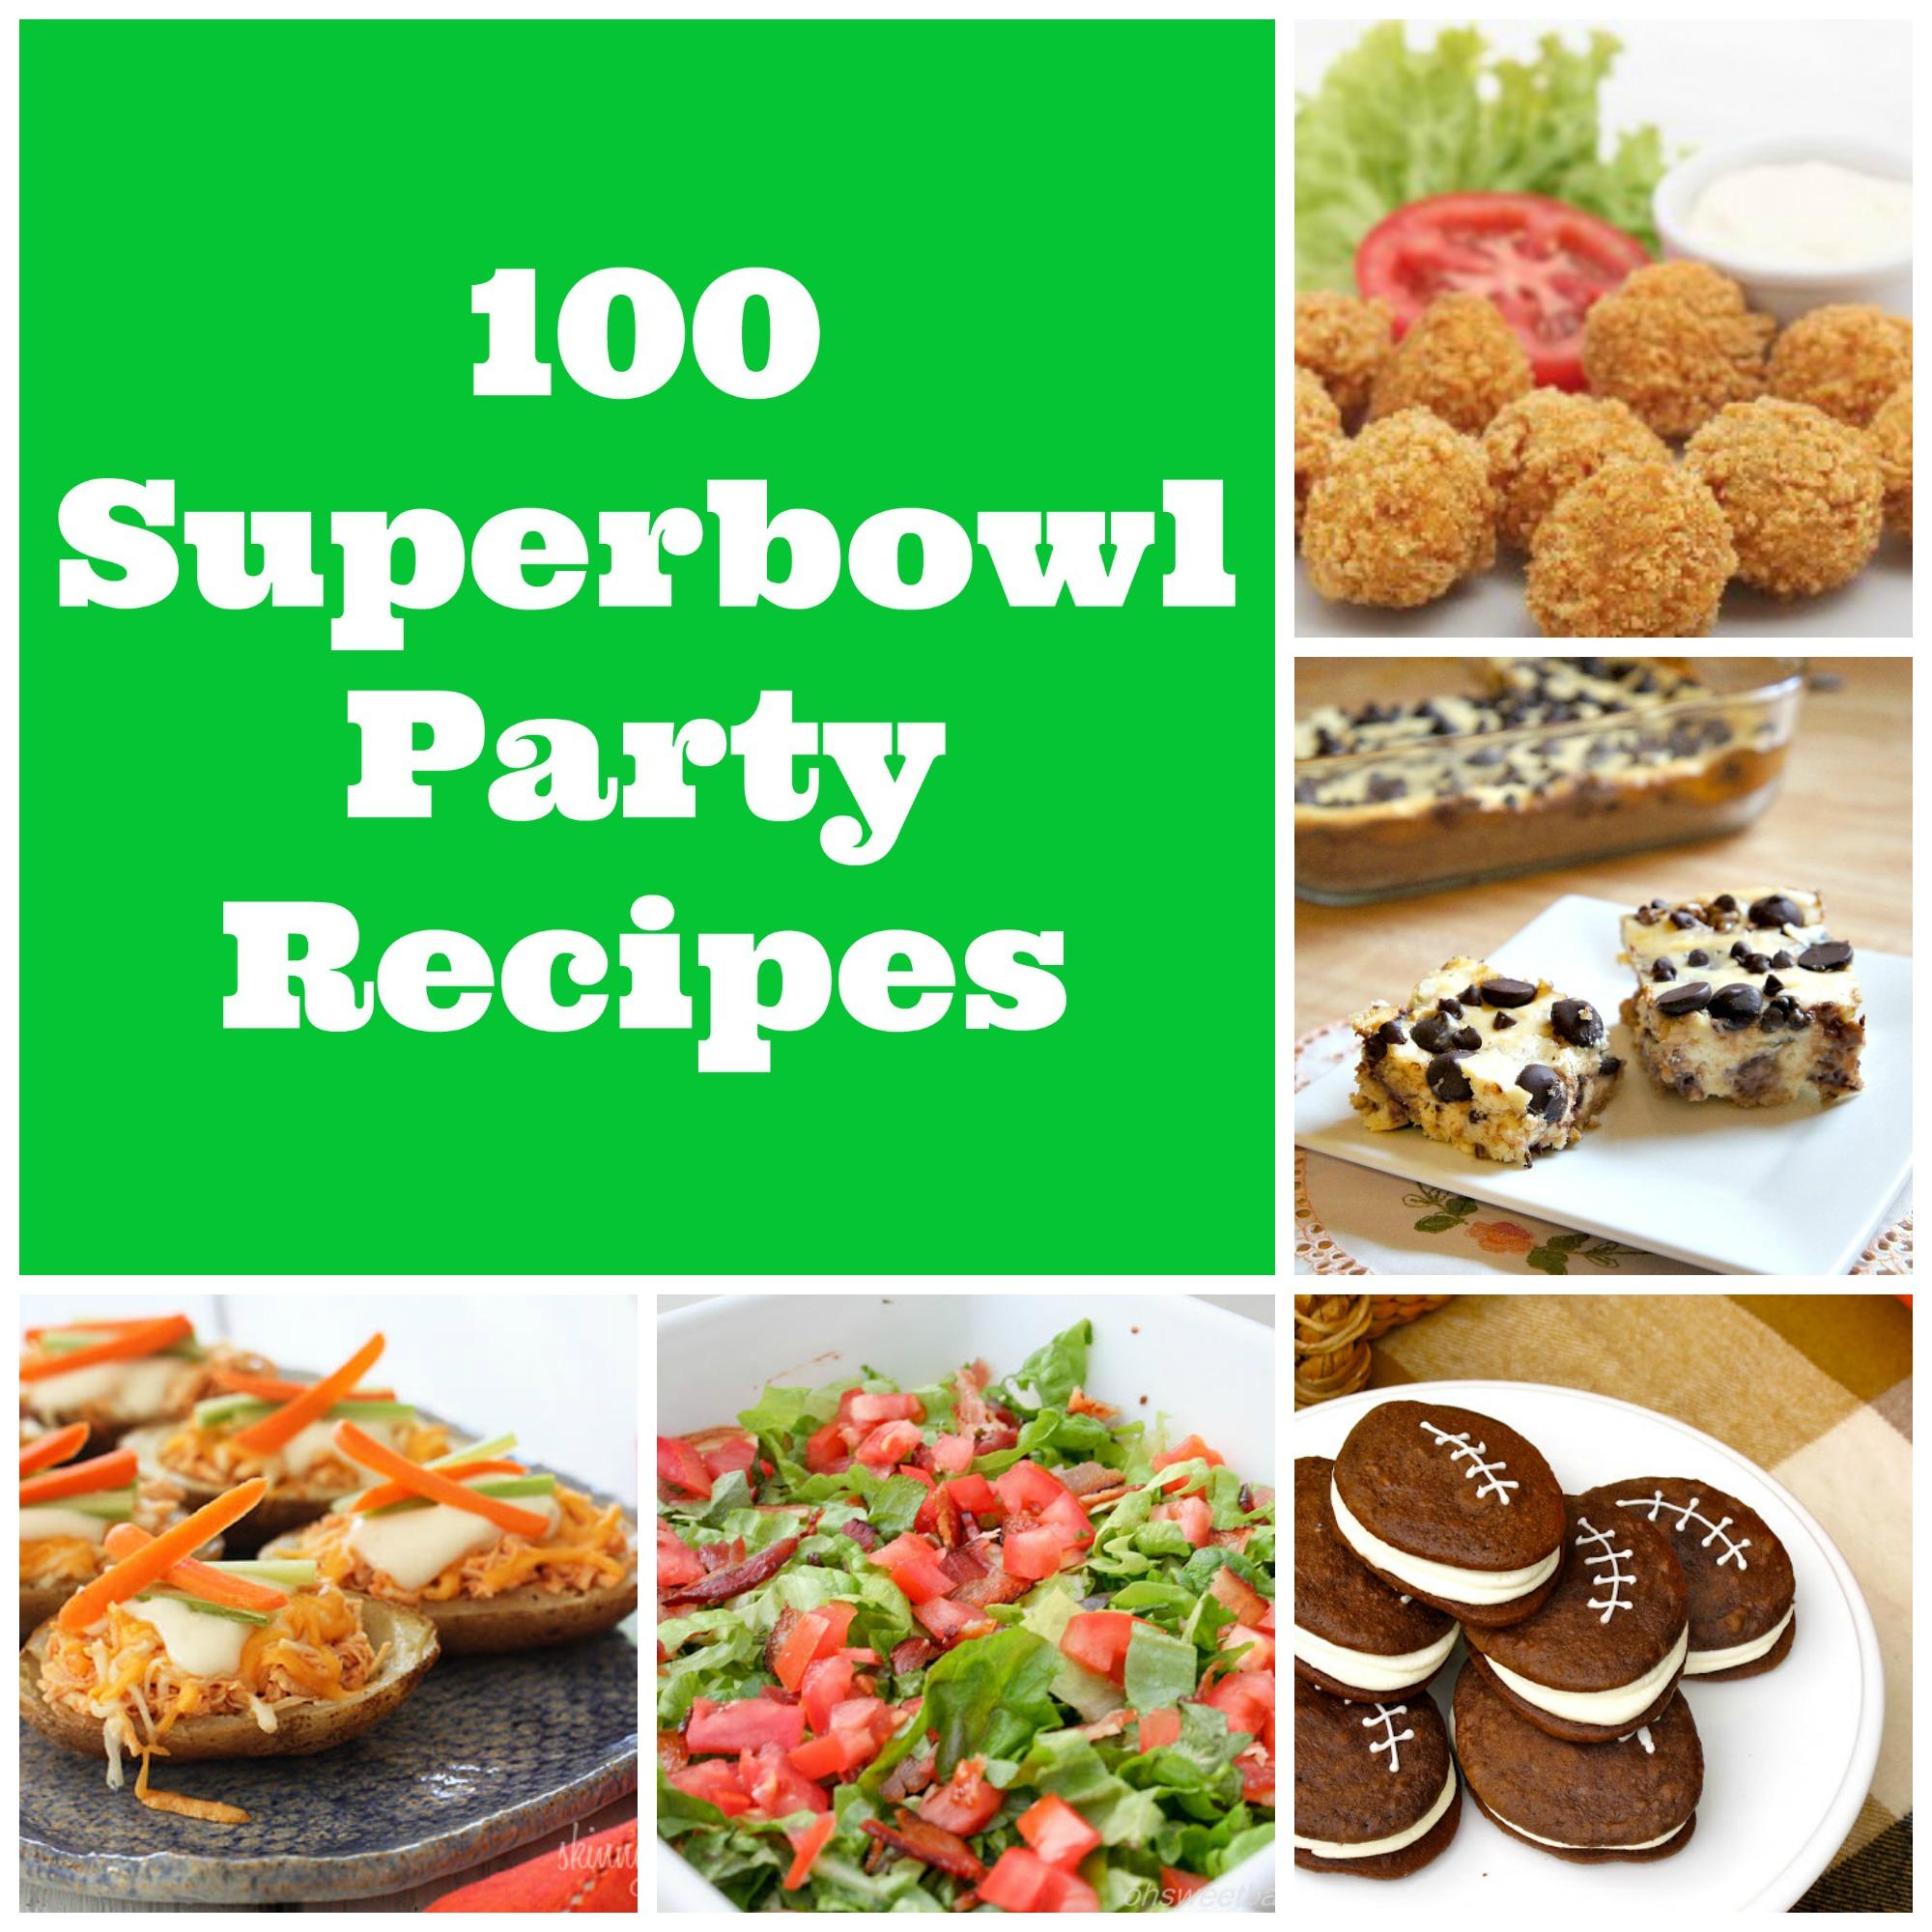 100 super bowl party recipe ideas my suburban kitchen